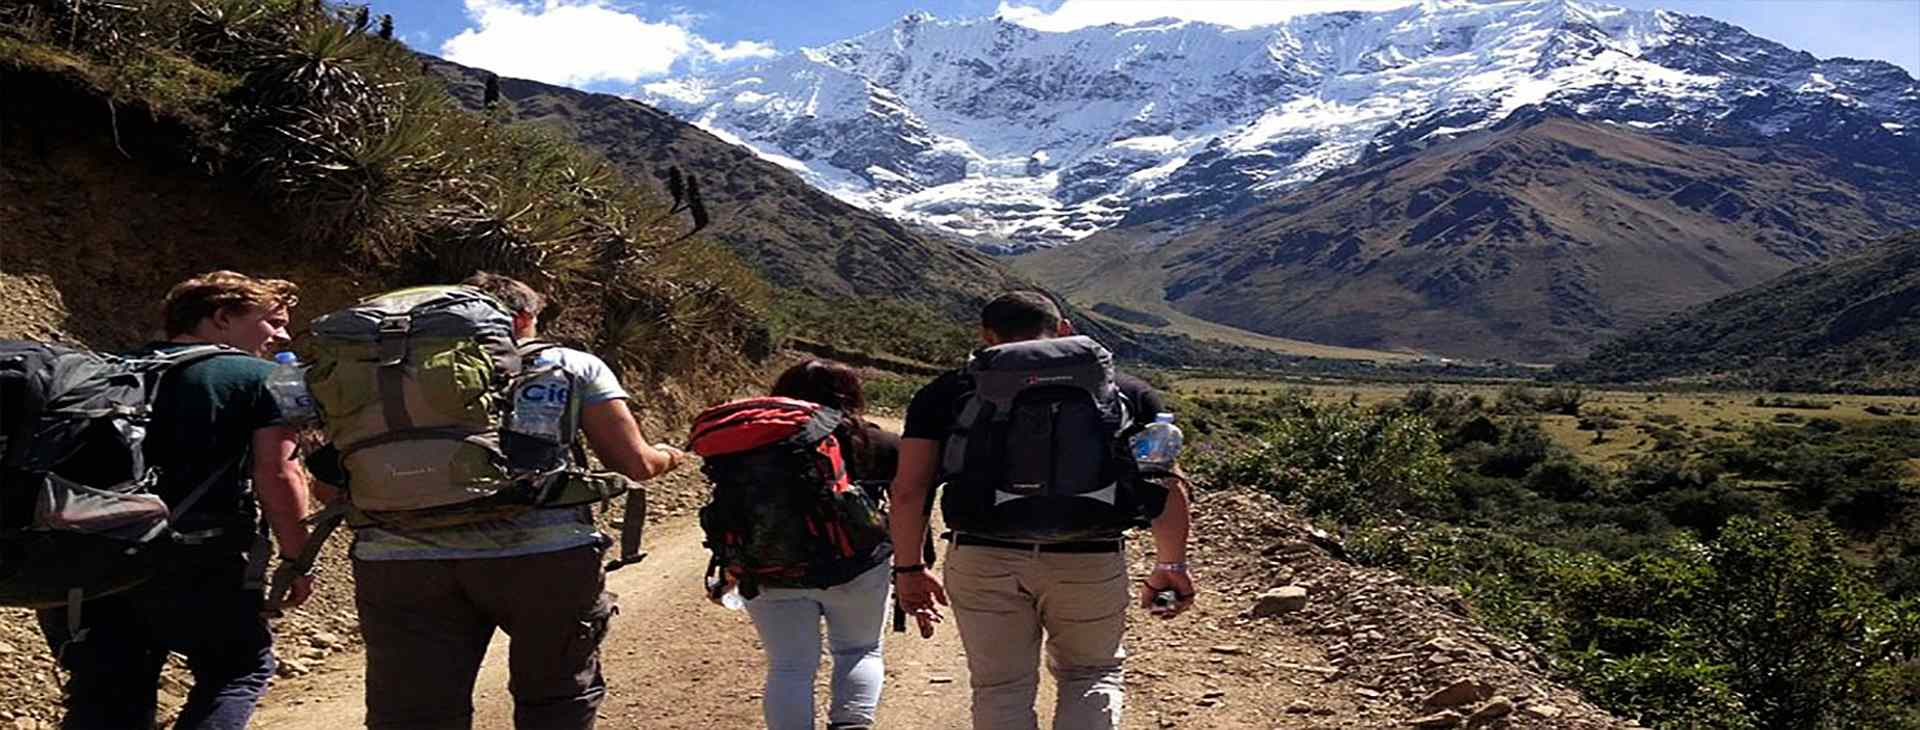 Salkantay a Machu Picchu Trek 5dias - TOURS PERU MACHU PICCHU